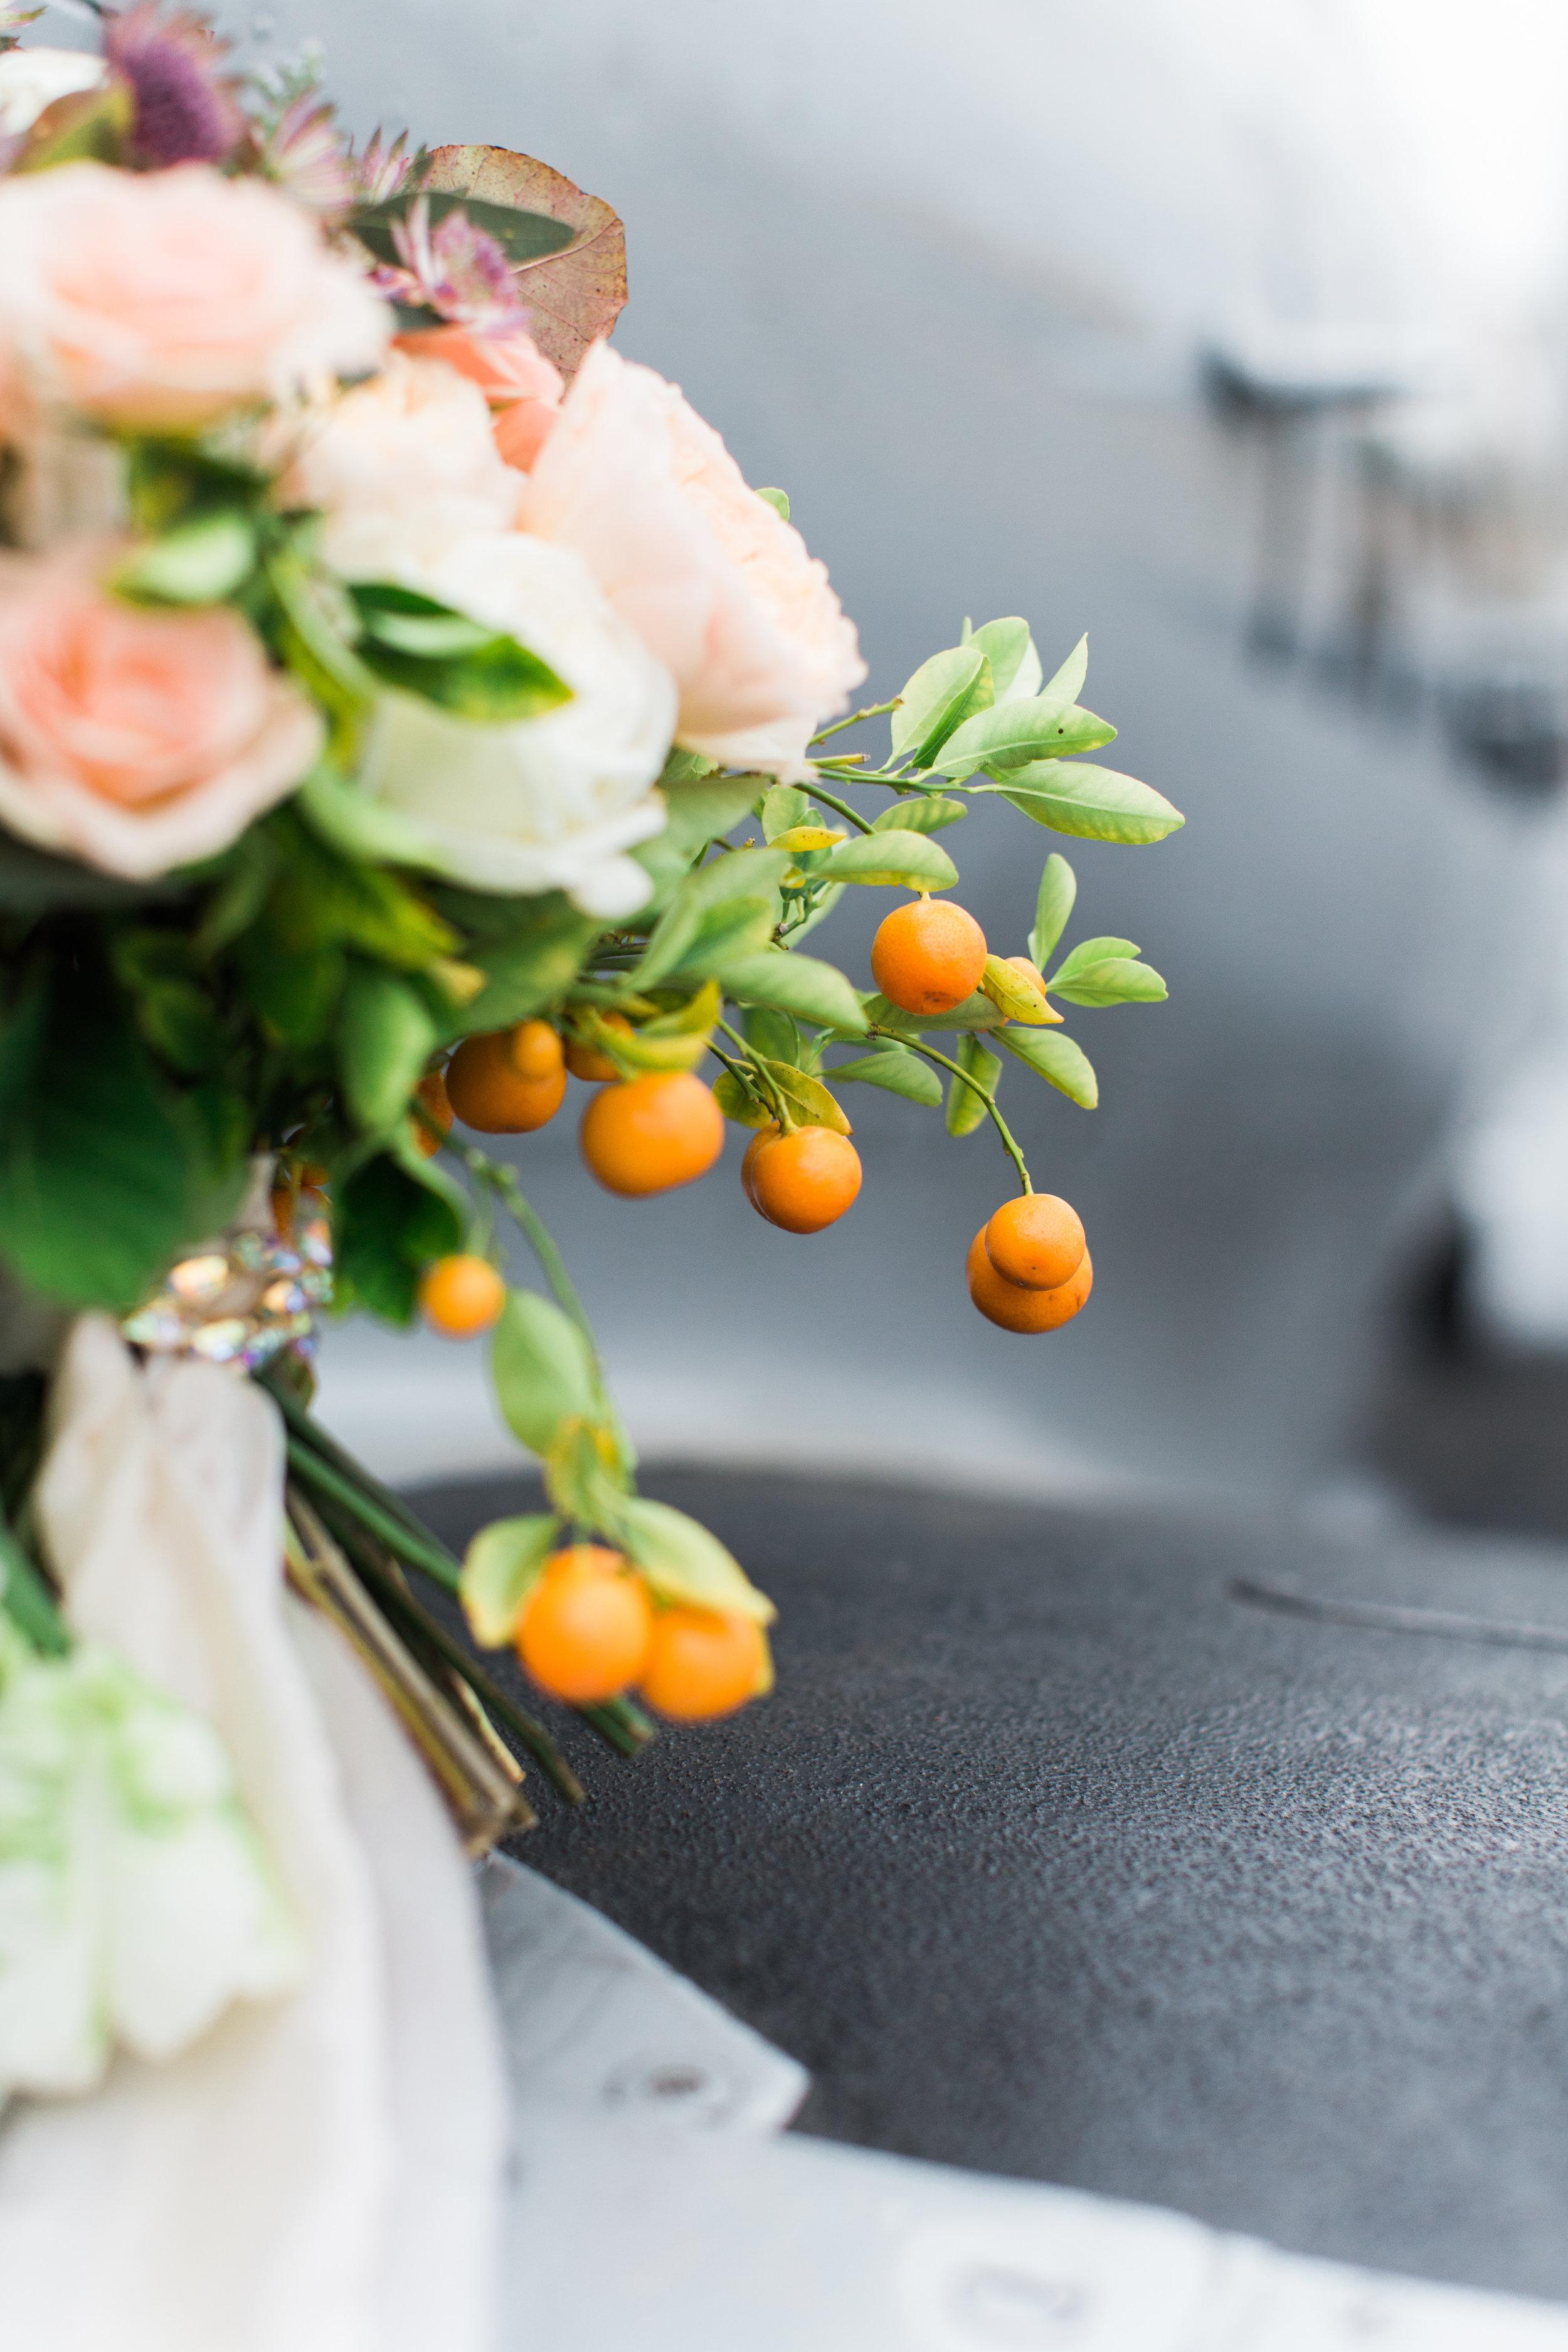 airport-hanger-wedding-at-attitude-aviation-in-livermore-91.jpg